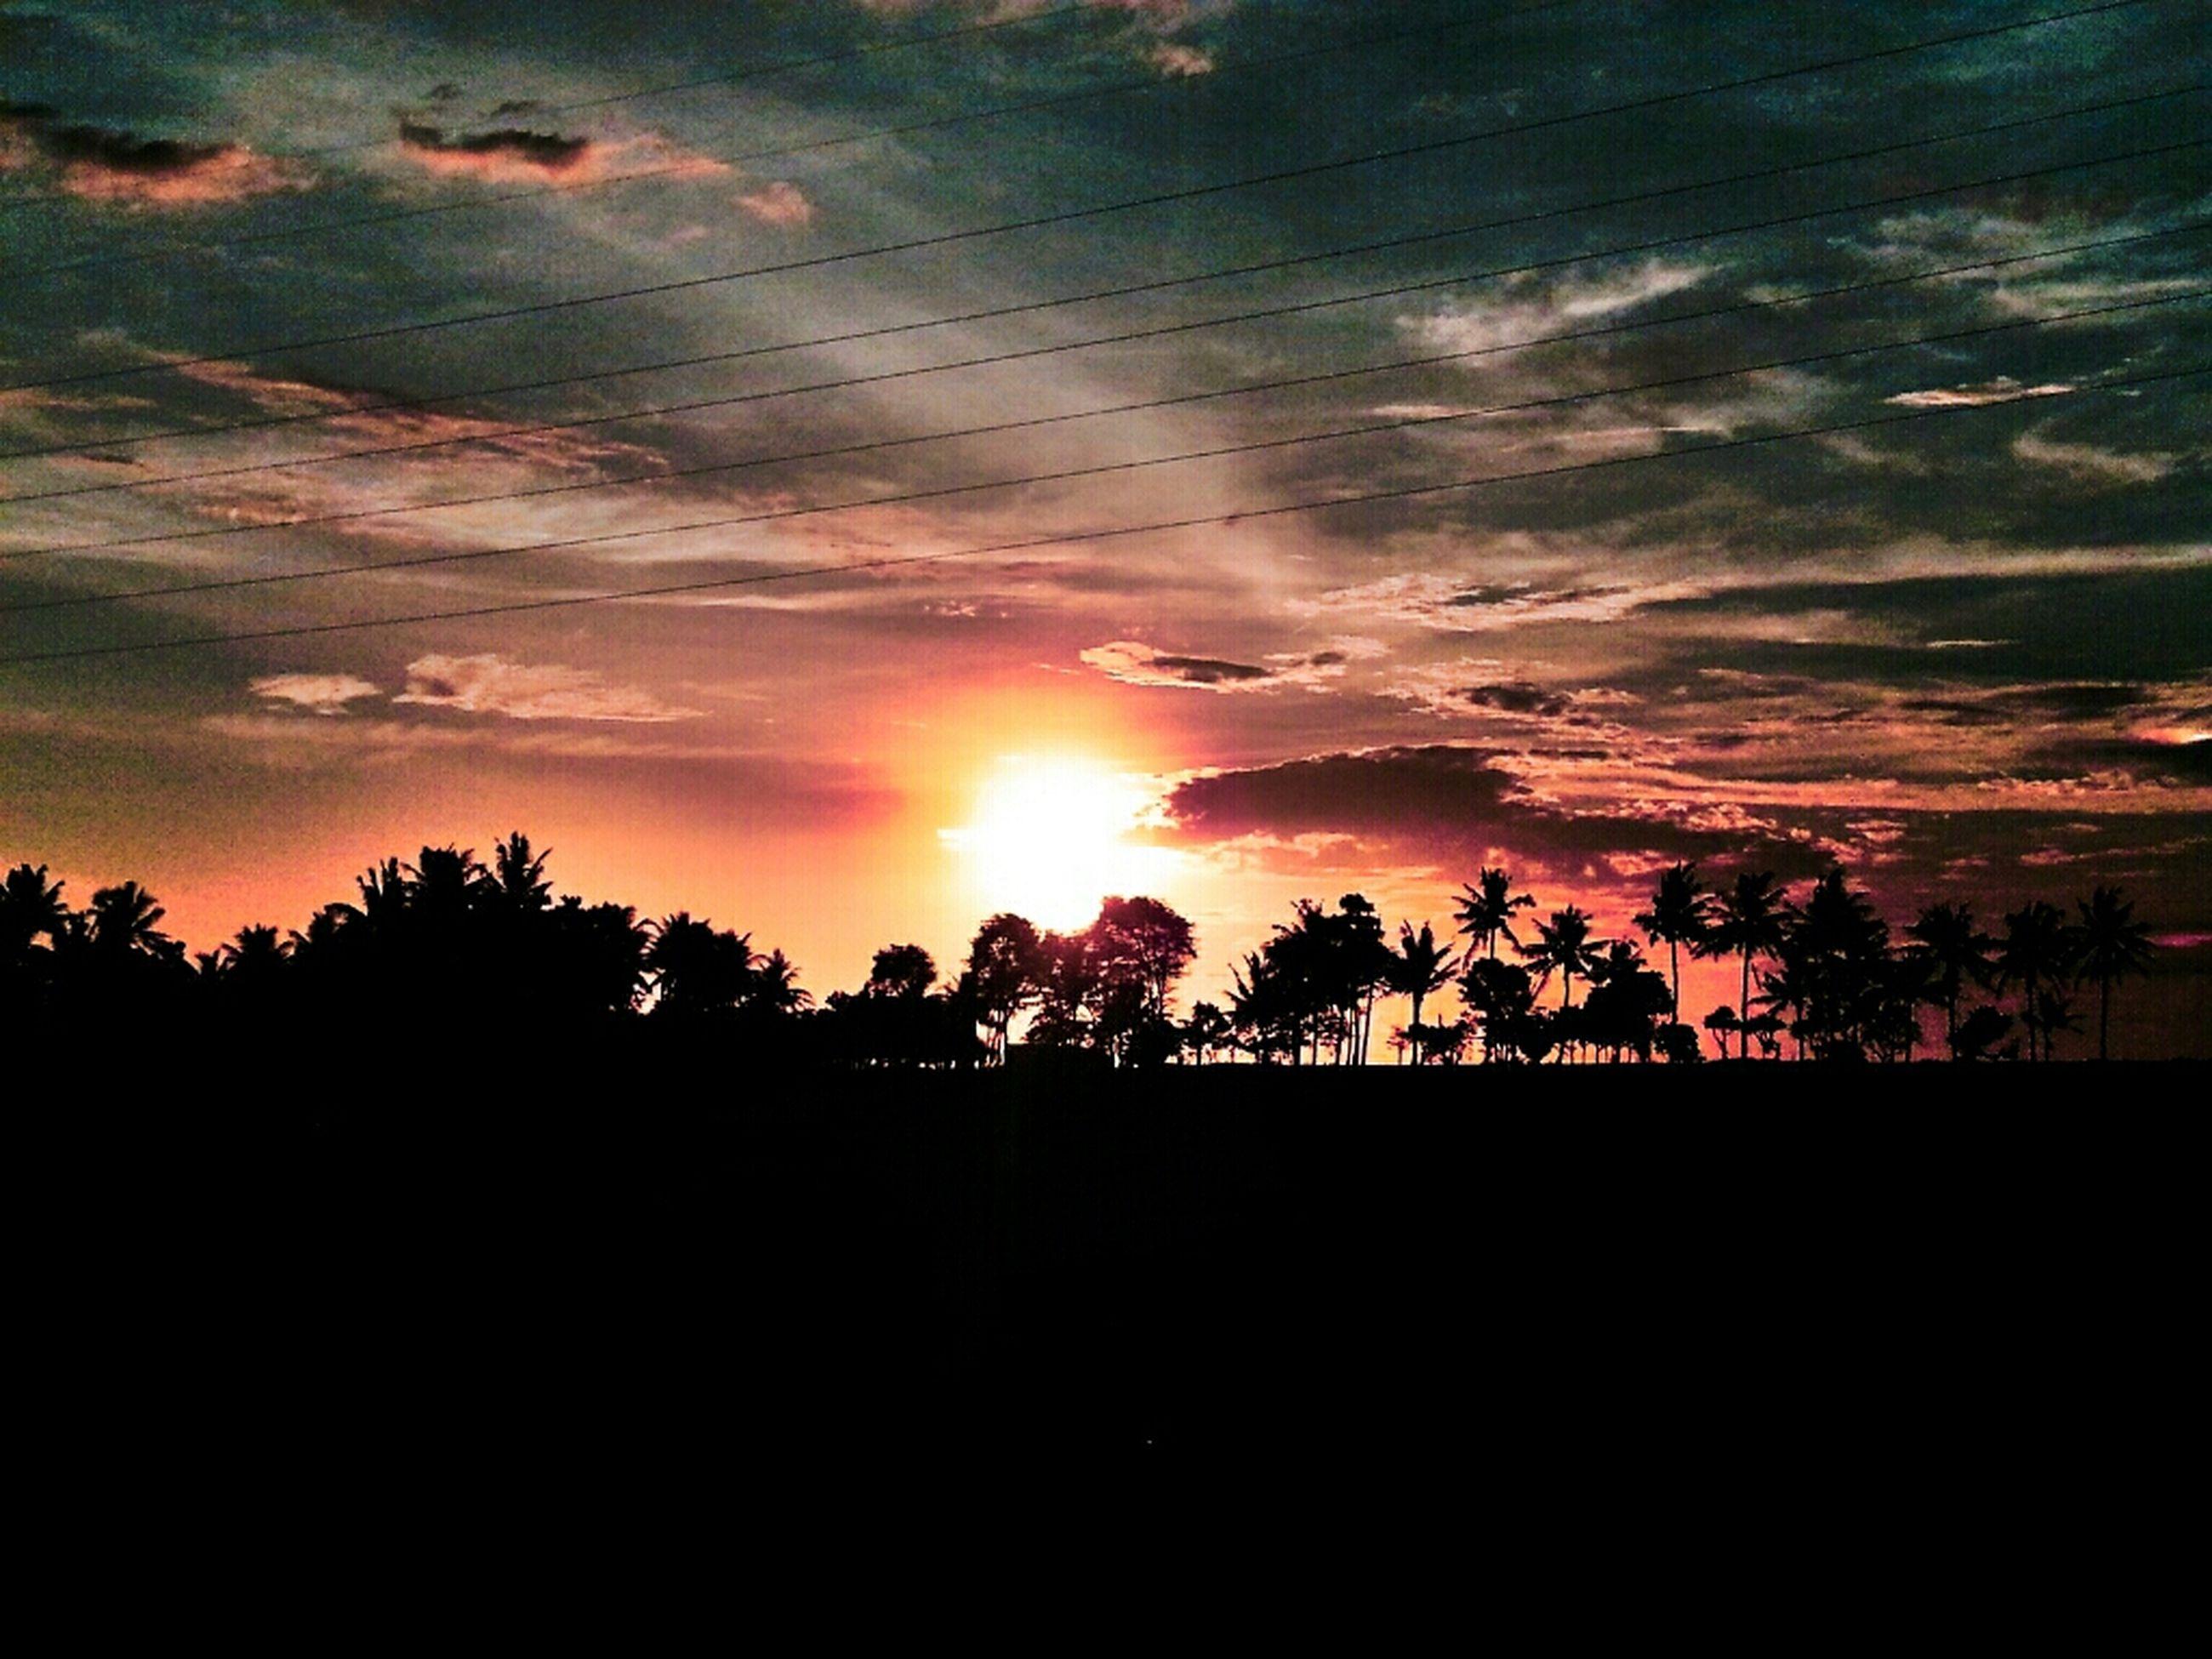 sunset, sun, silhouette, tree, tranquil scene, scenics, tranquility, beauty in nature, sky, sunlight, orange color, nature, idyllic, sunbeam, landscape, cloud - sky, lens flare, back lit, growth, no people